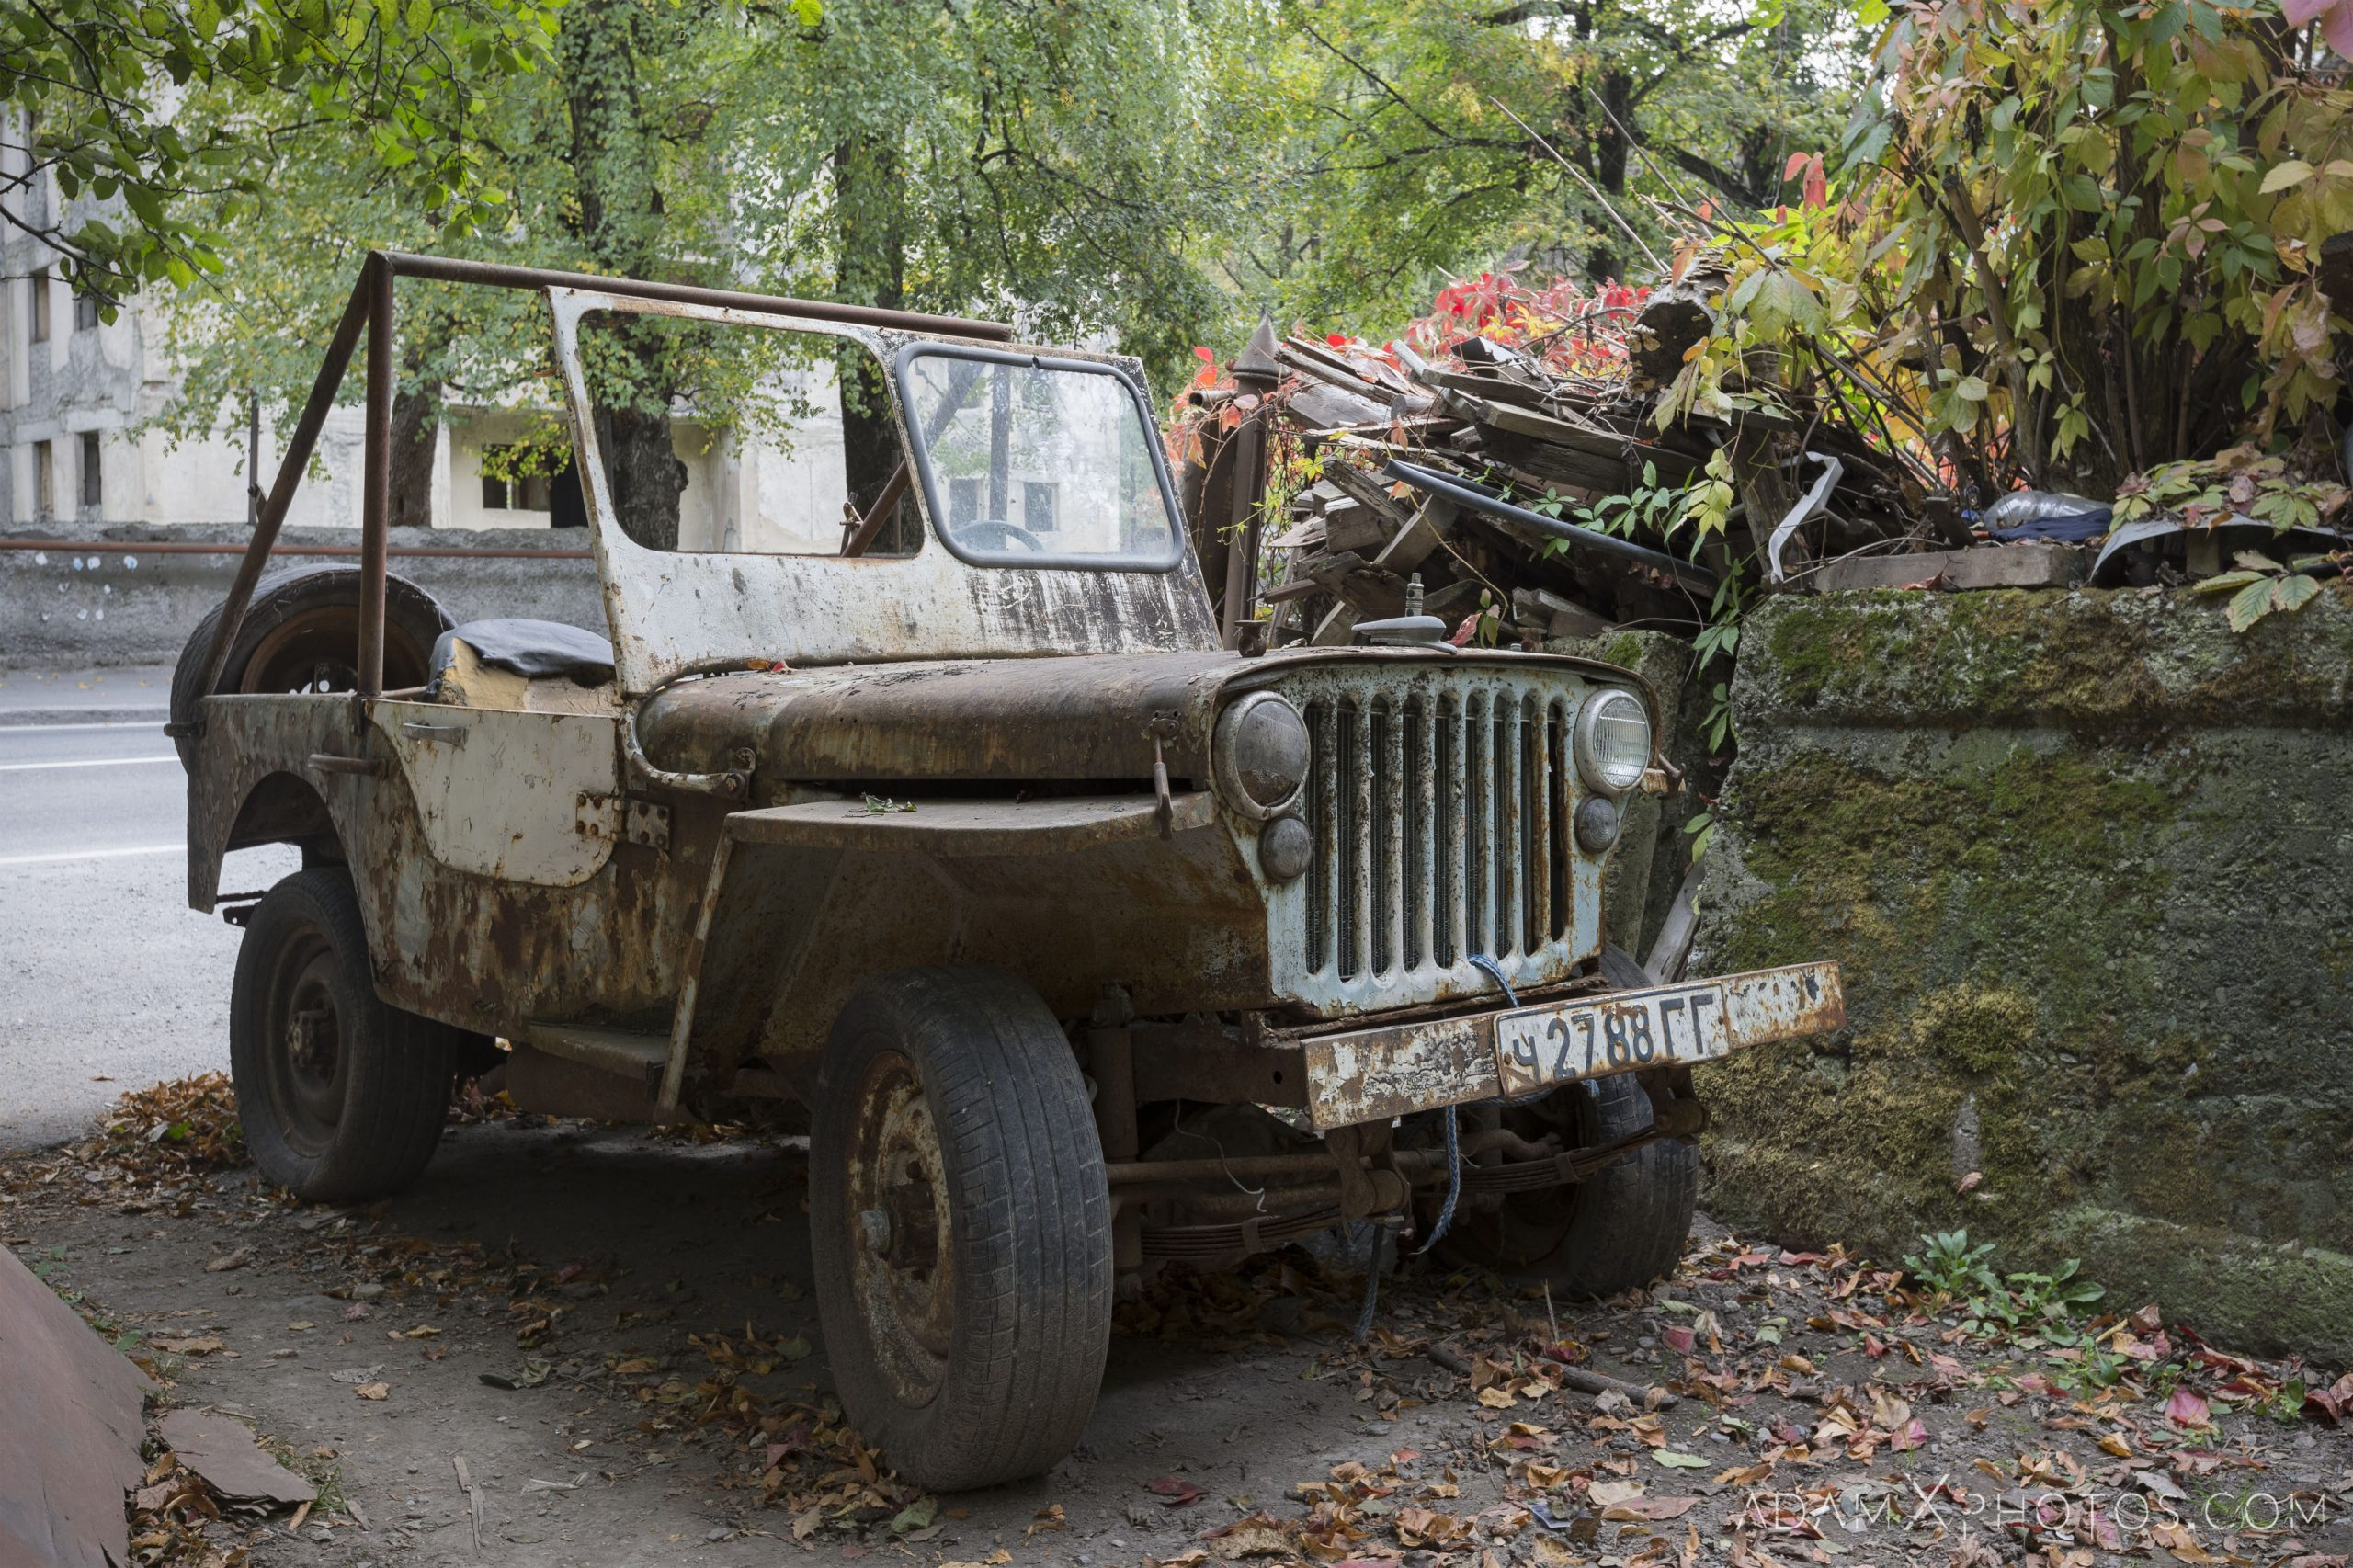 Rusty old jeep Car Vehicle Vehicles Graveyard rusting road trip Georgia Adam X AdamXPhotos Urbex Urban Exploration 2018 Abandoned ruins lost forgotten derelict location